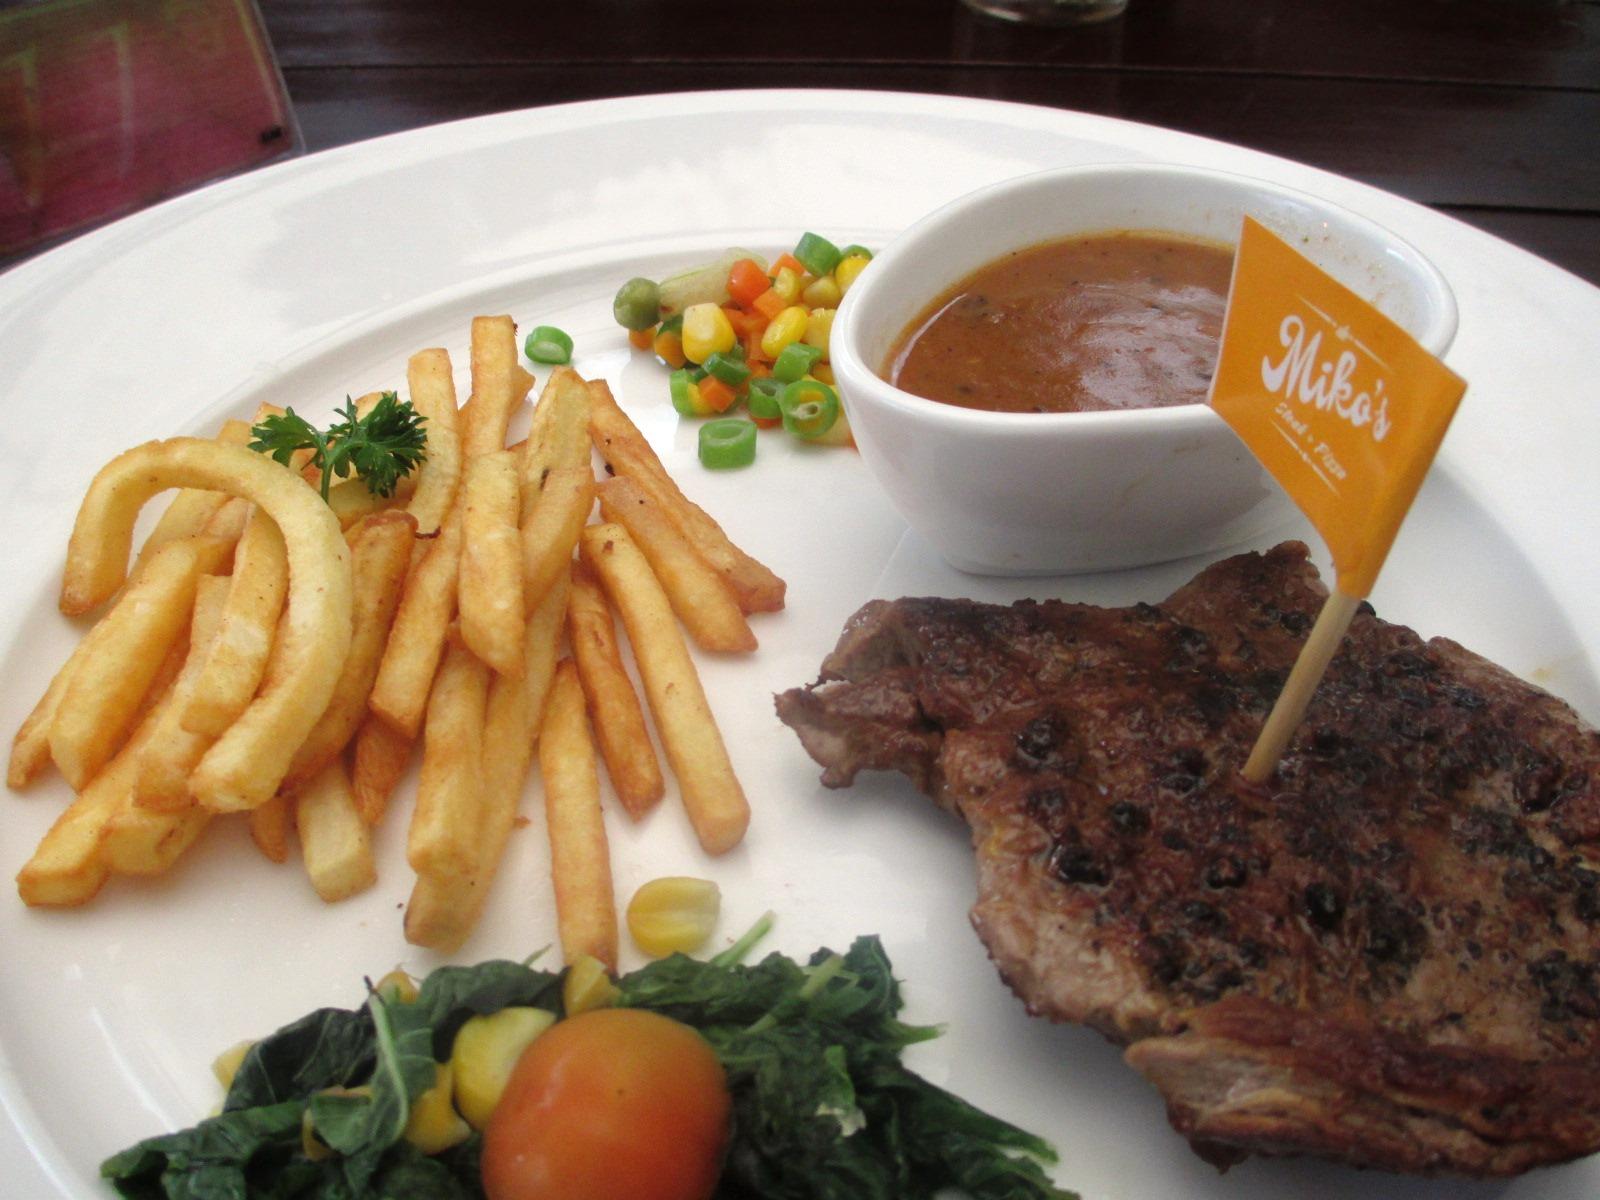 adeknakemal jalan2 makan2 d kuliner de miko 39 s steak